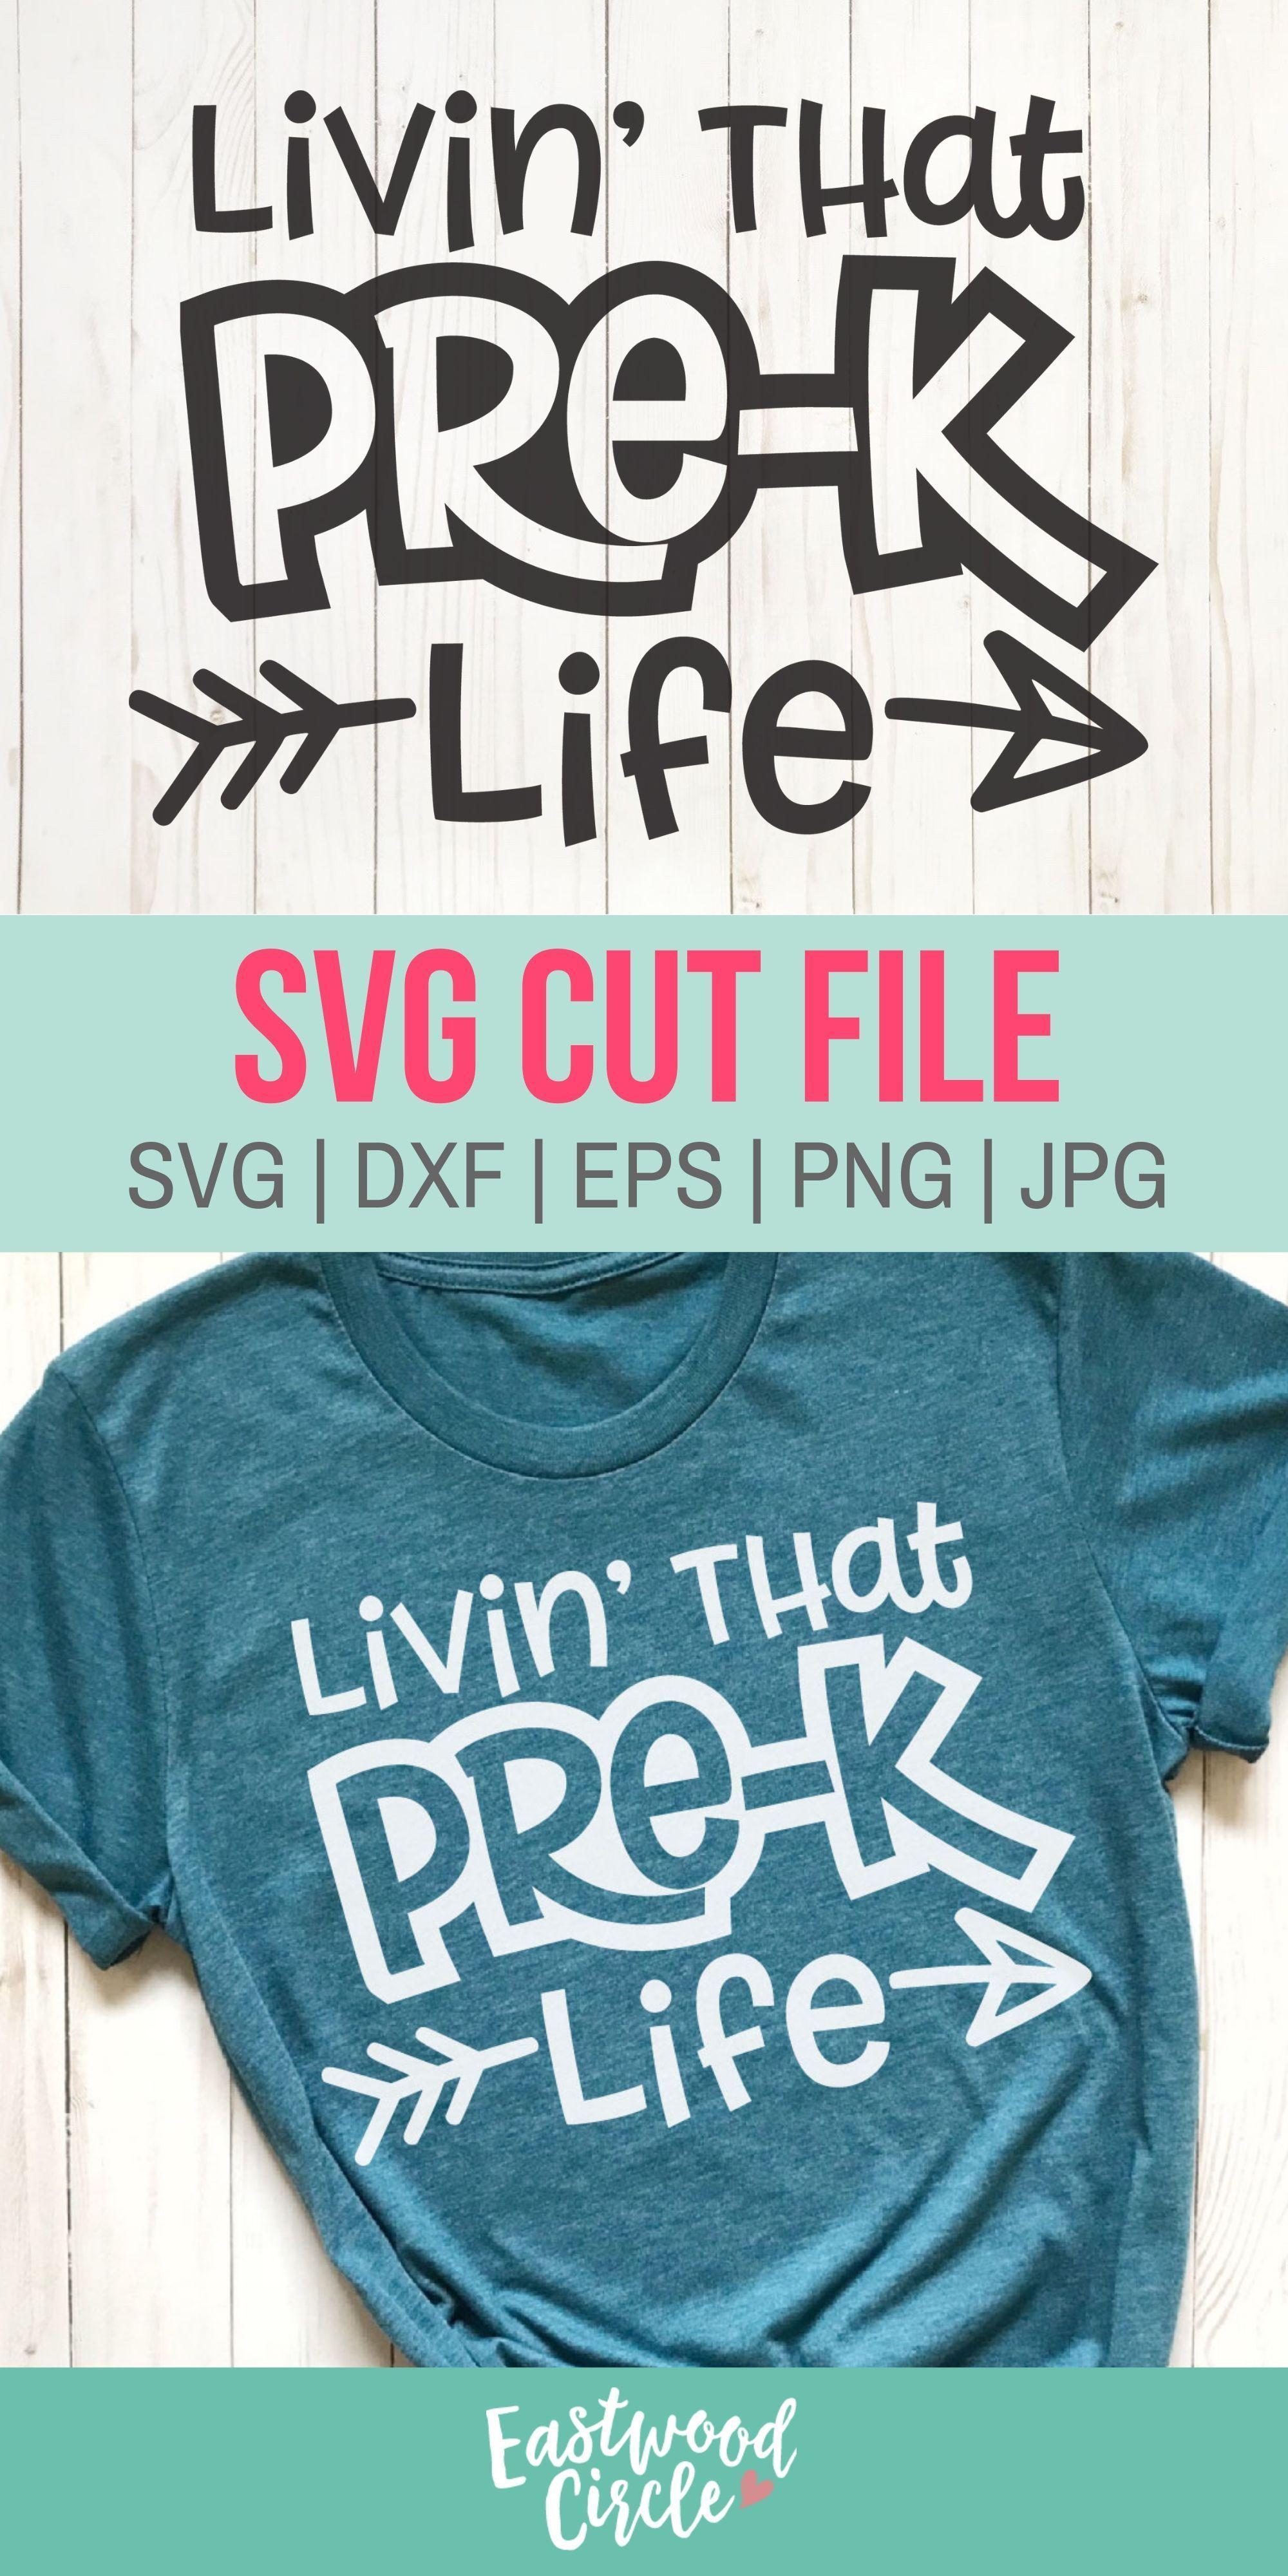 Livin That Pre K Life svg, Livin That Prek Life svg, Pre K